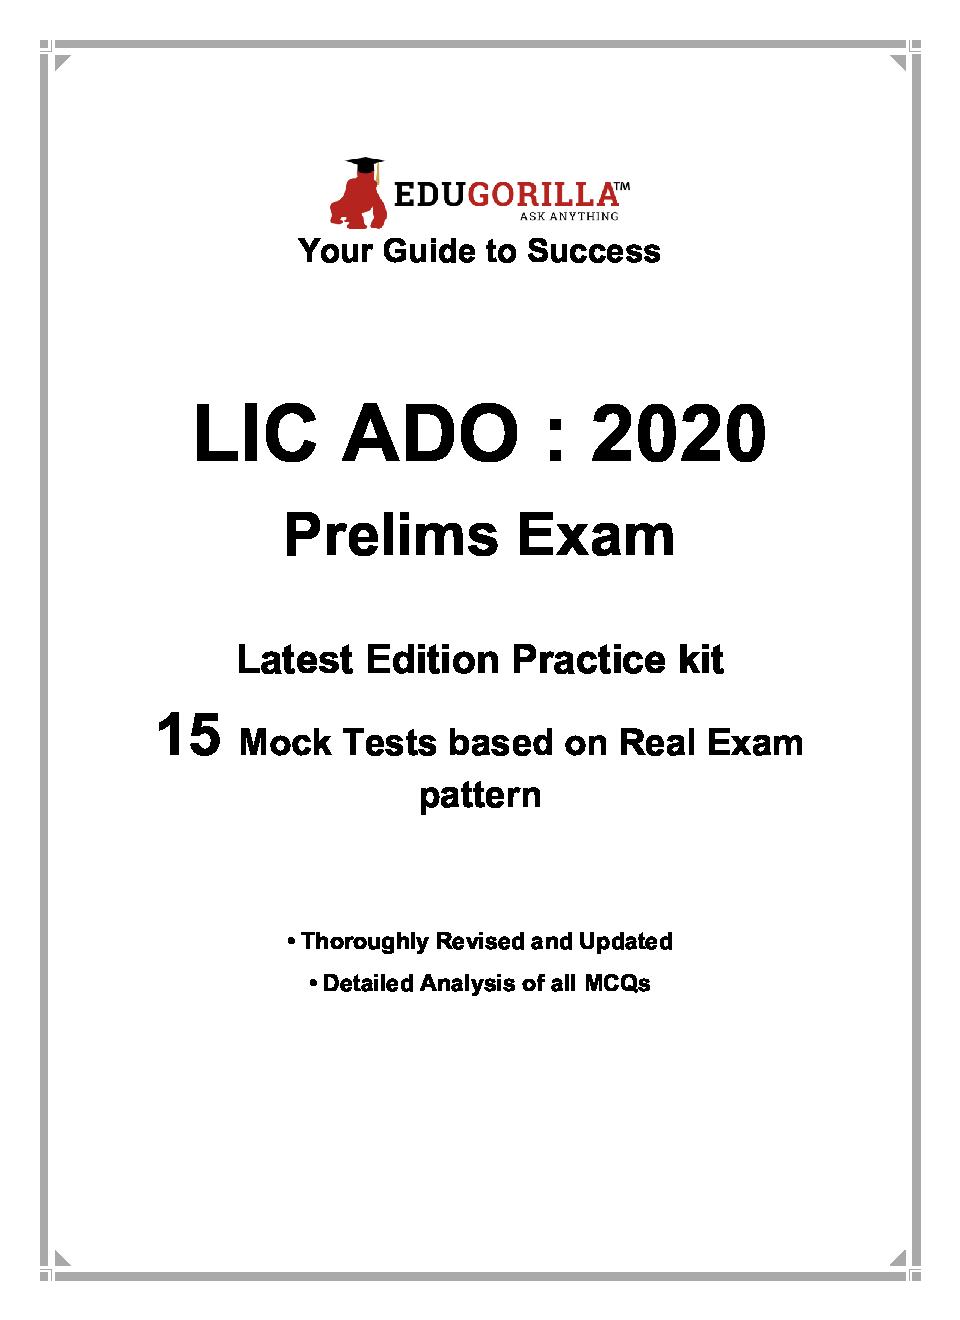 EduGorilla LIC ADO Prelims Exam 2020 | 15 Mock Test - Page 3